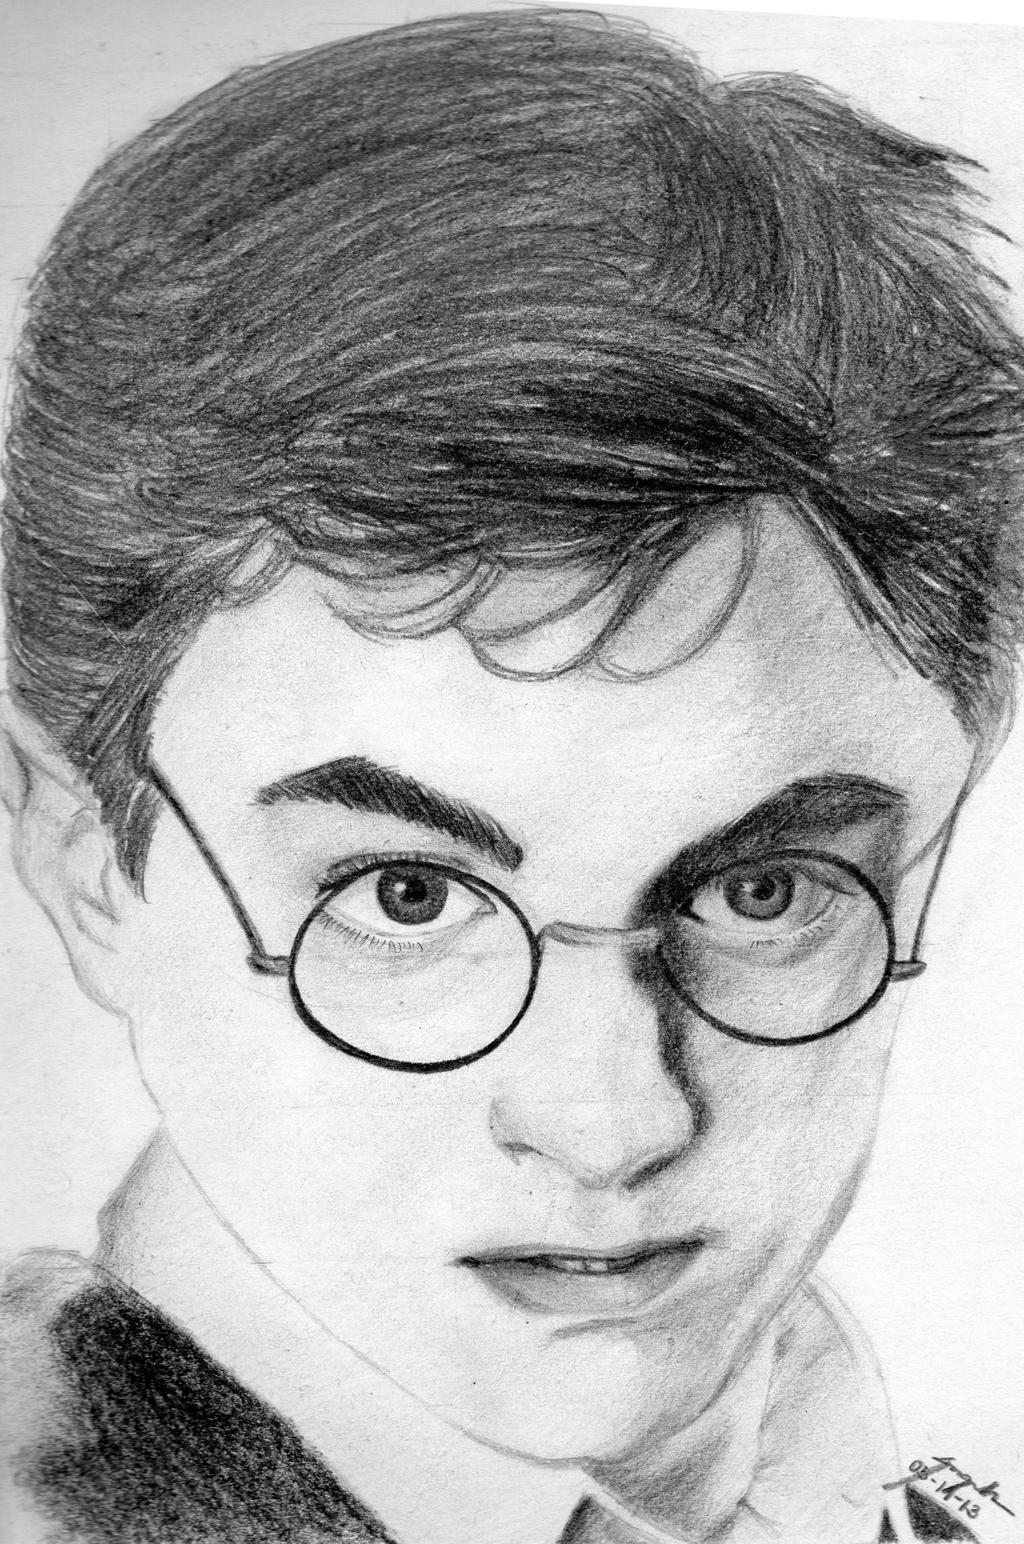 Harry Potter Sketch by ButterflyInMaze on DeviantArt